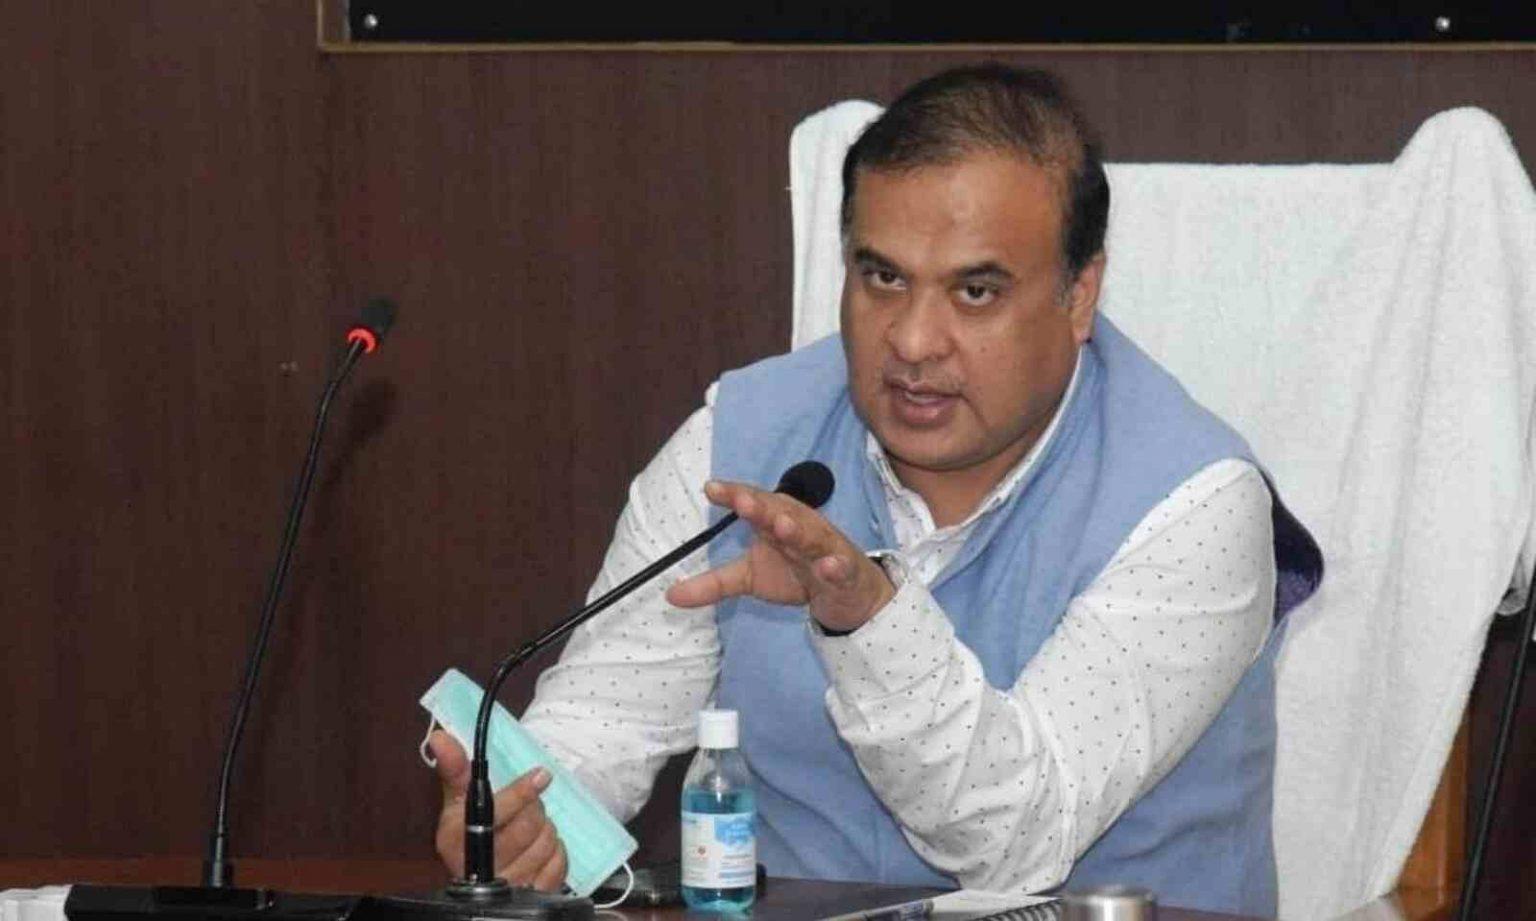 Assam CM Himanta Biswa assures govt jobs for National Games Medalists| ദേശീയ ഗെയിംസ് മെഡൽ ജേതാക്കൾക്ക് സർക്കാർ ജോലി ഉറപ്പ് വരുത്തുമെന്ന് ആസാം മുഖ്യമന്ത്രി ഹിമന്ത ബിശ്വ ഉറപ്പുനൽകി_40.1